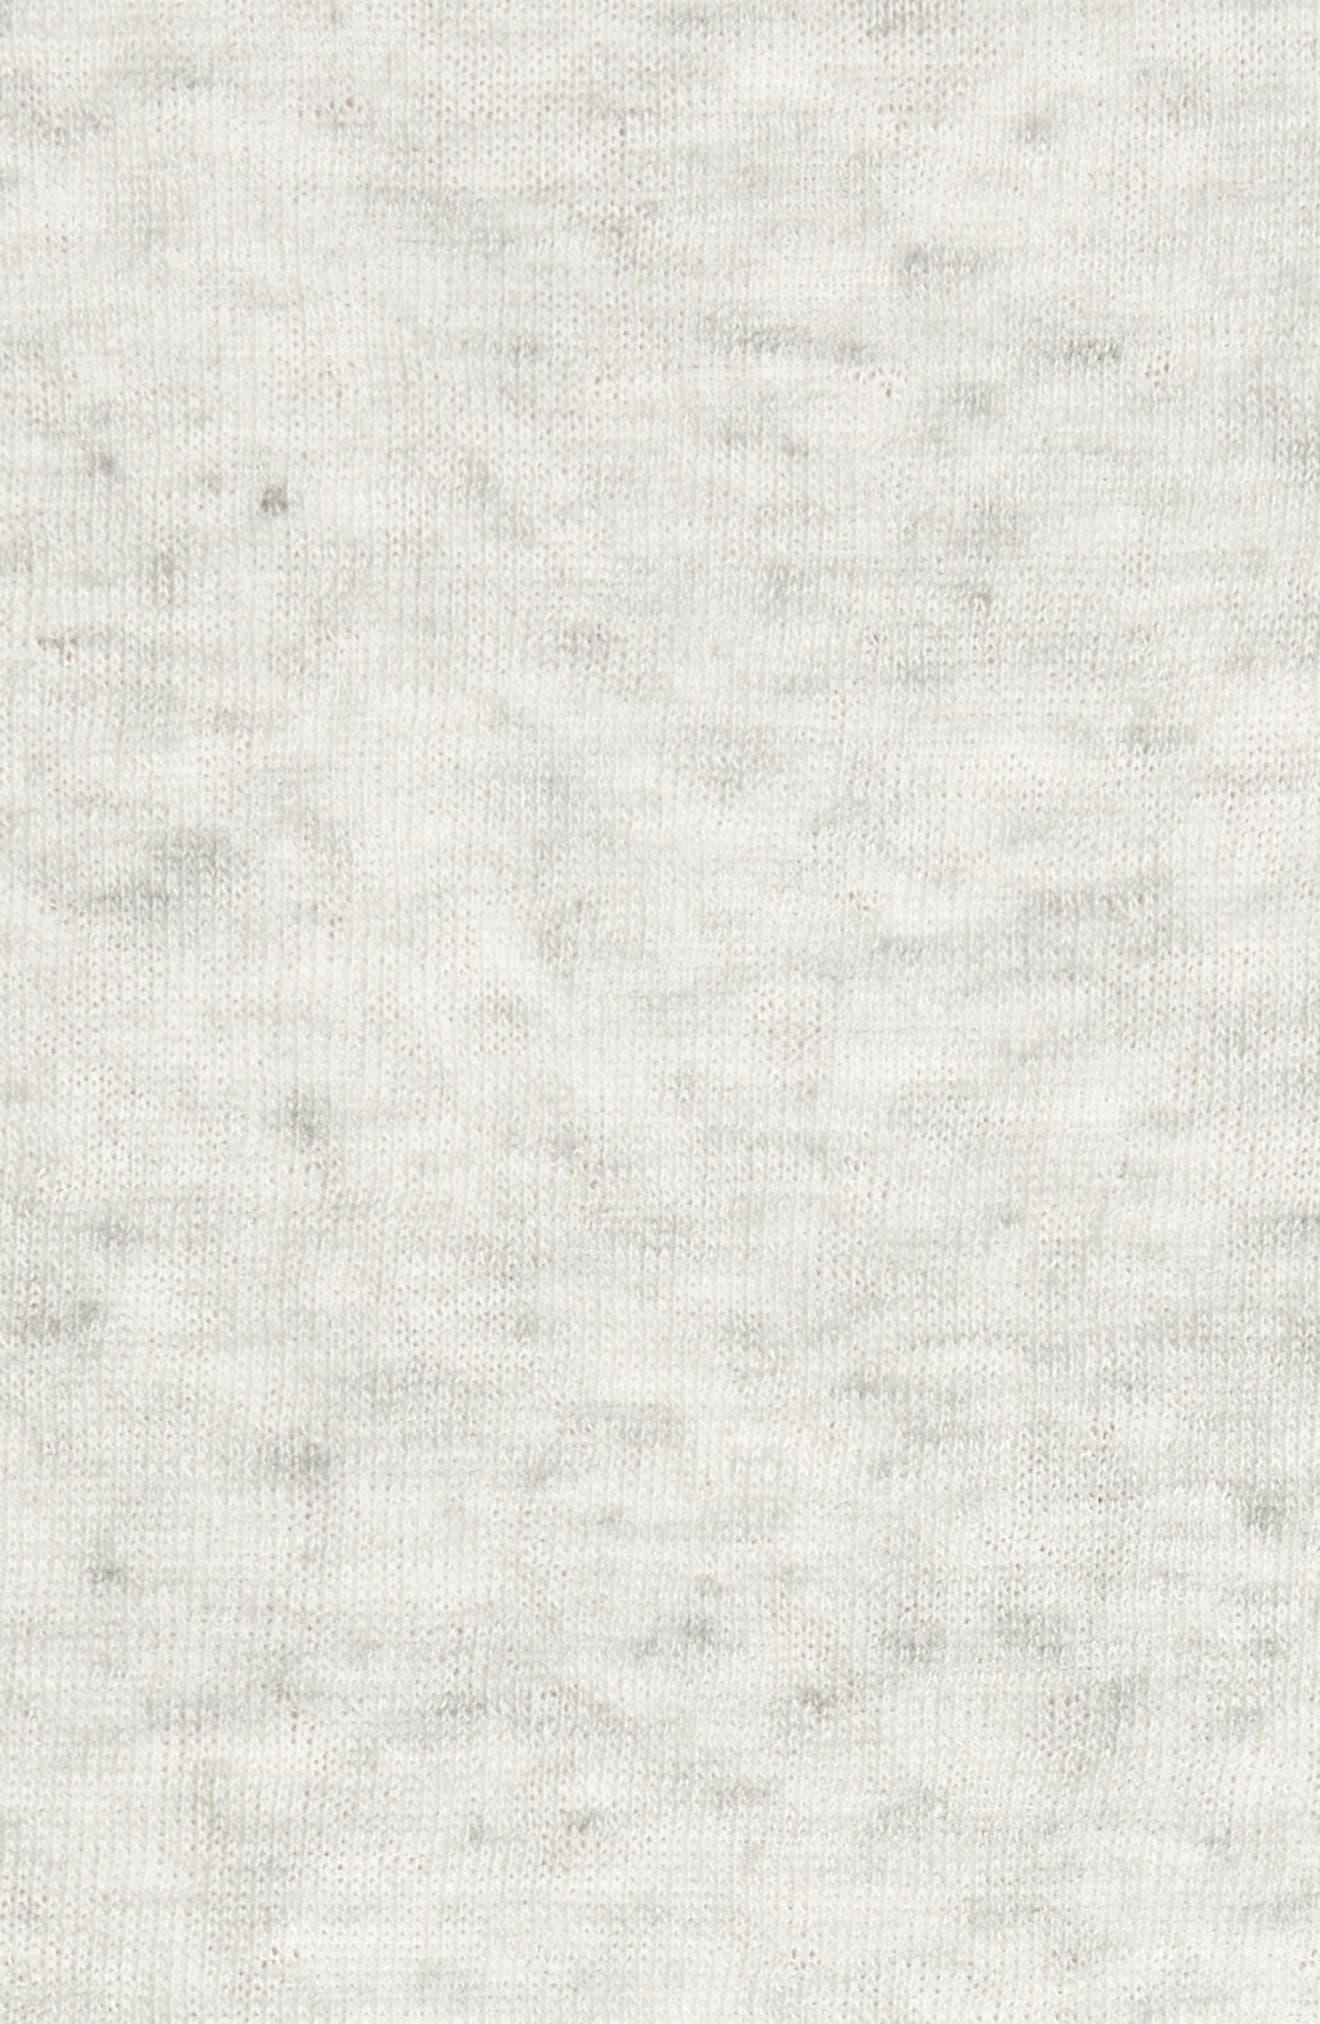 Tripp Cotton & Wool T-Shirt,                             Alternate thumbnail 5, color,                             068